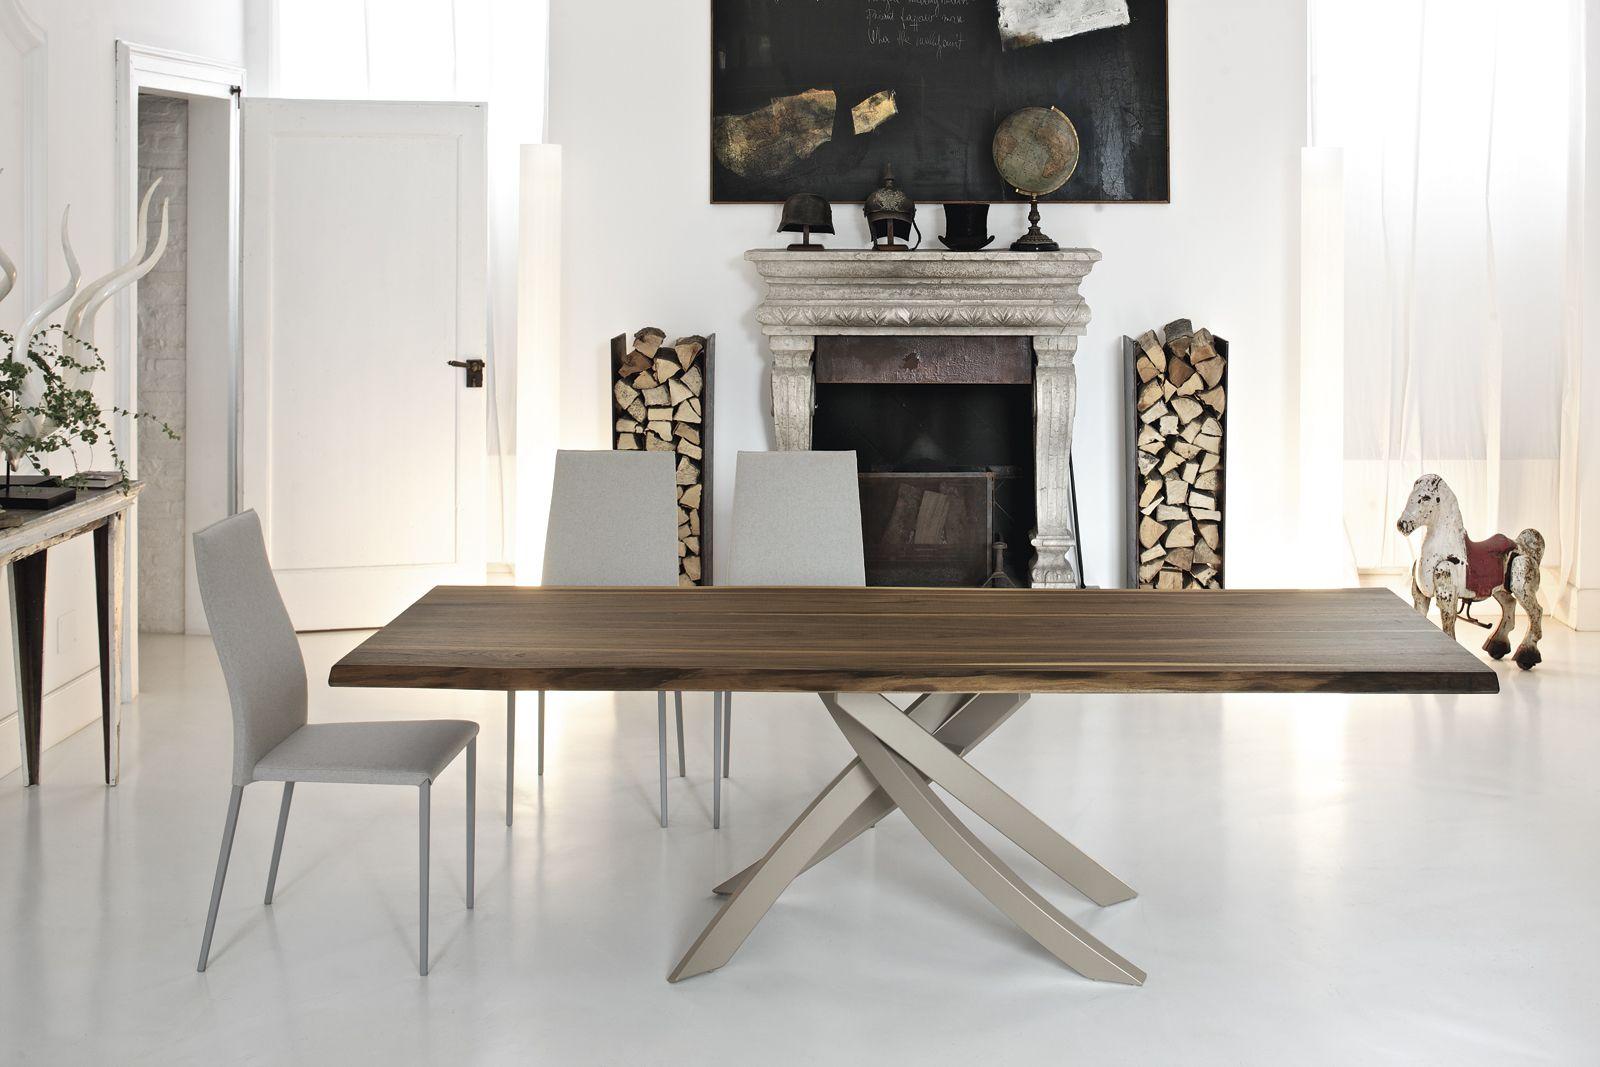 Tavolo Salvaspazio ~ Tavolo allungabile design moderno friulsedie boston